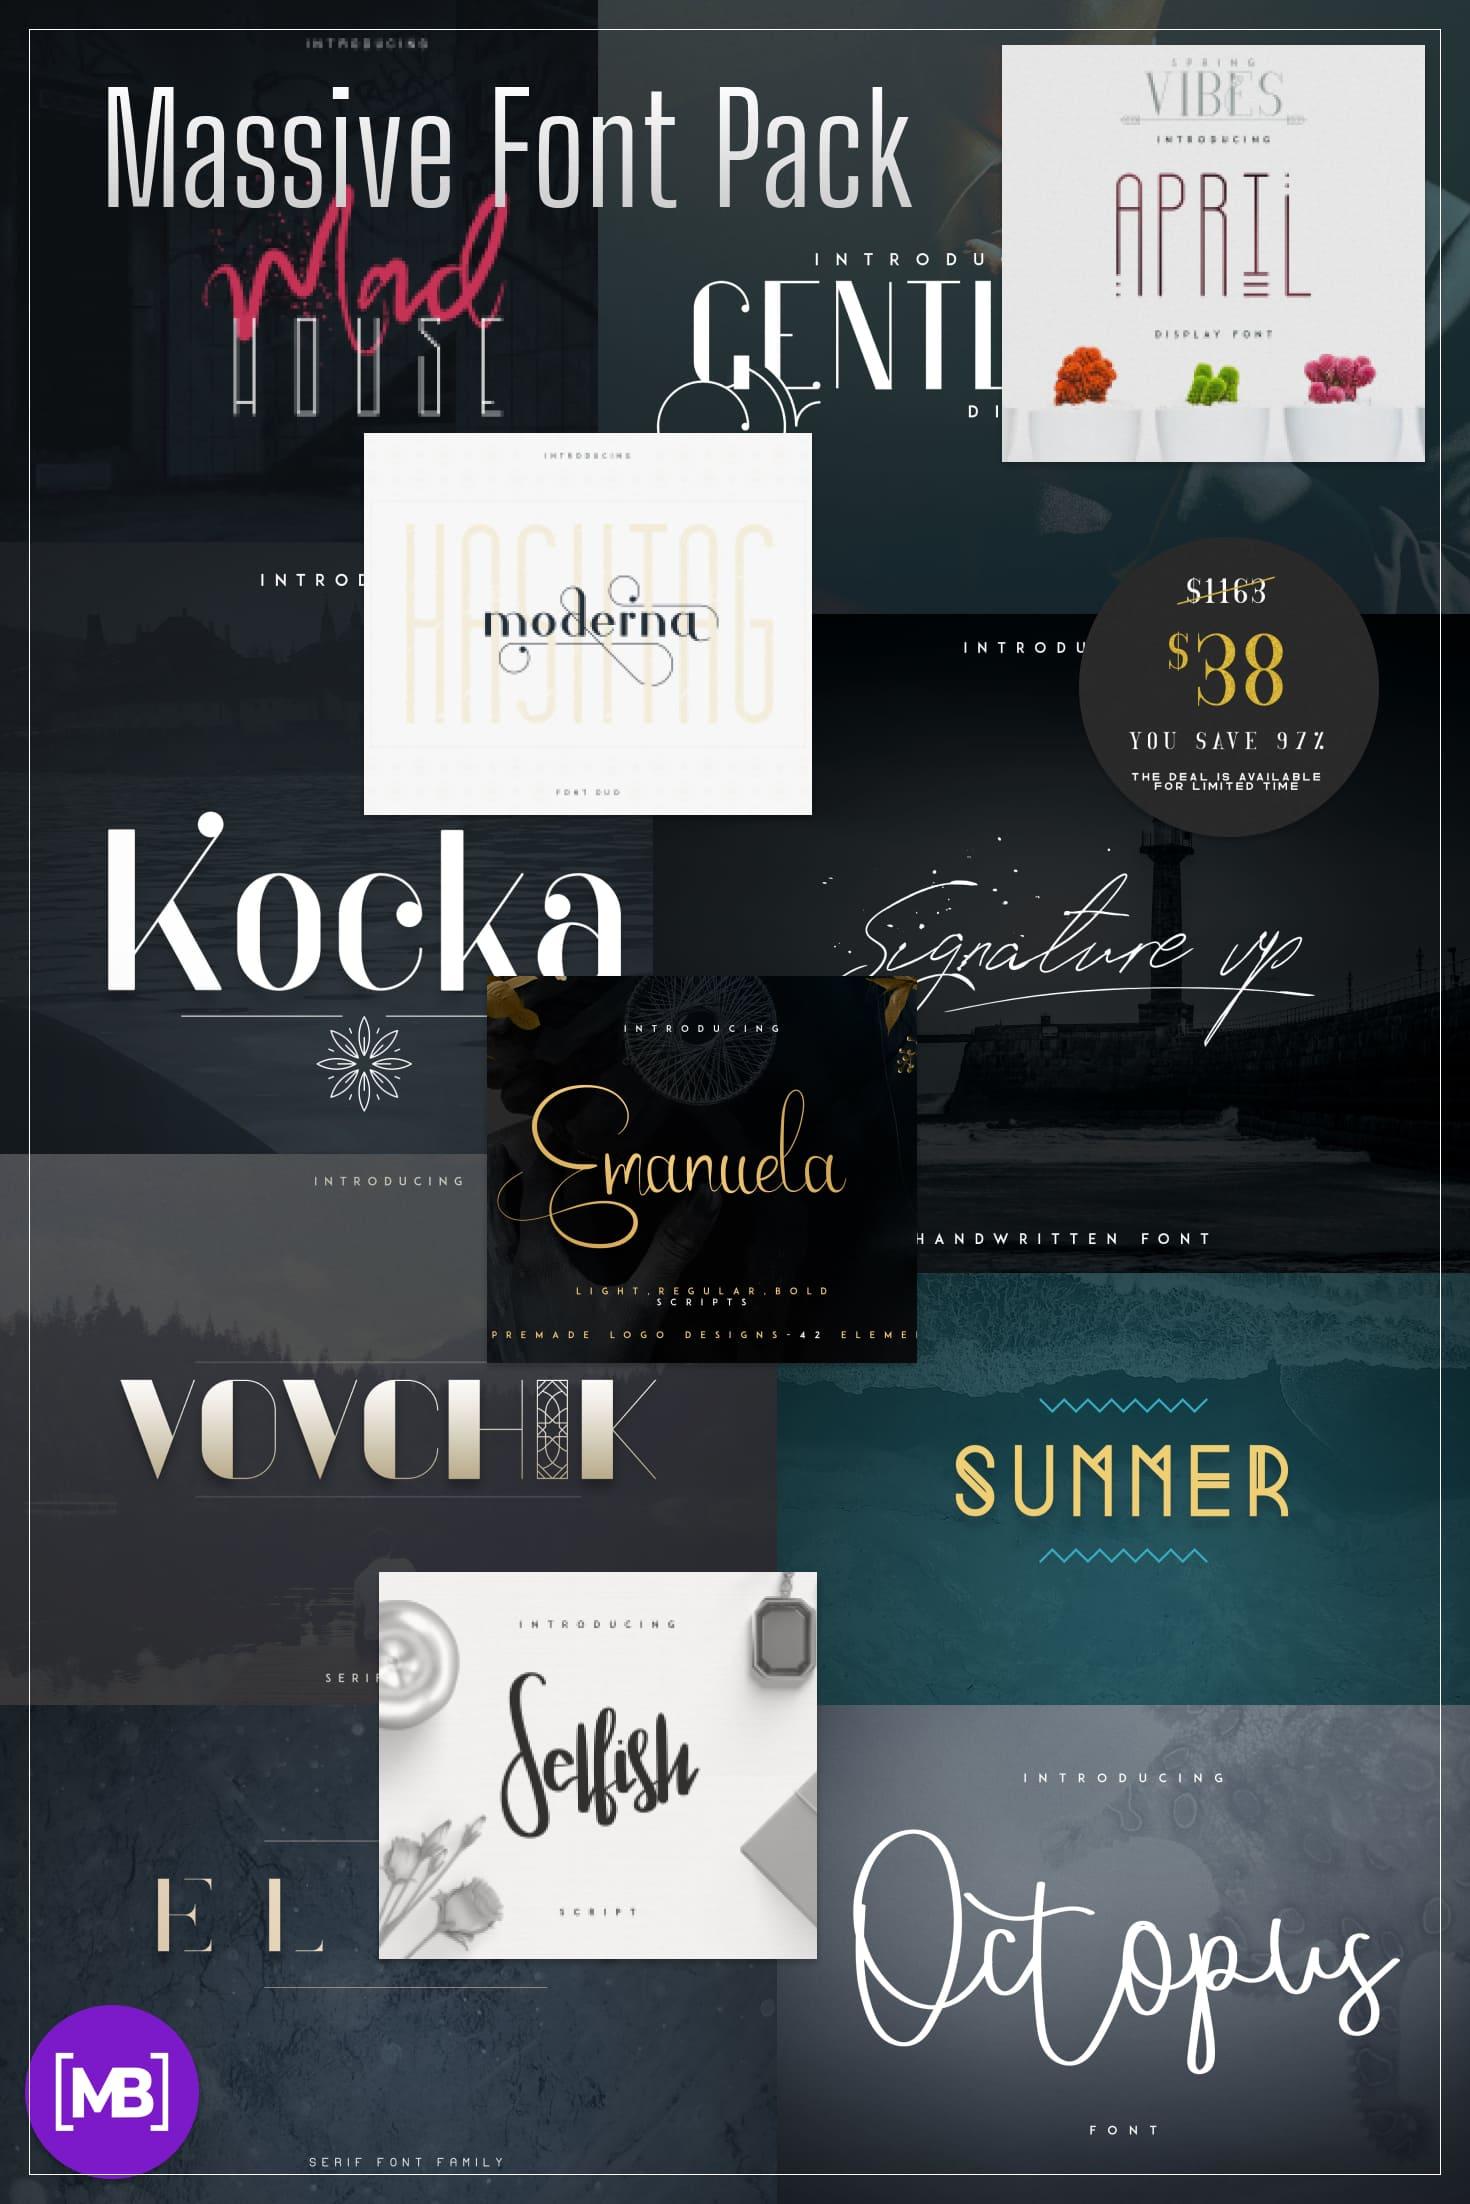 Pinterest Image: Massive Font Pack - 197 Fonts in 52 Font Families.